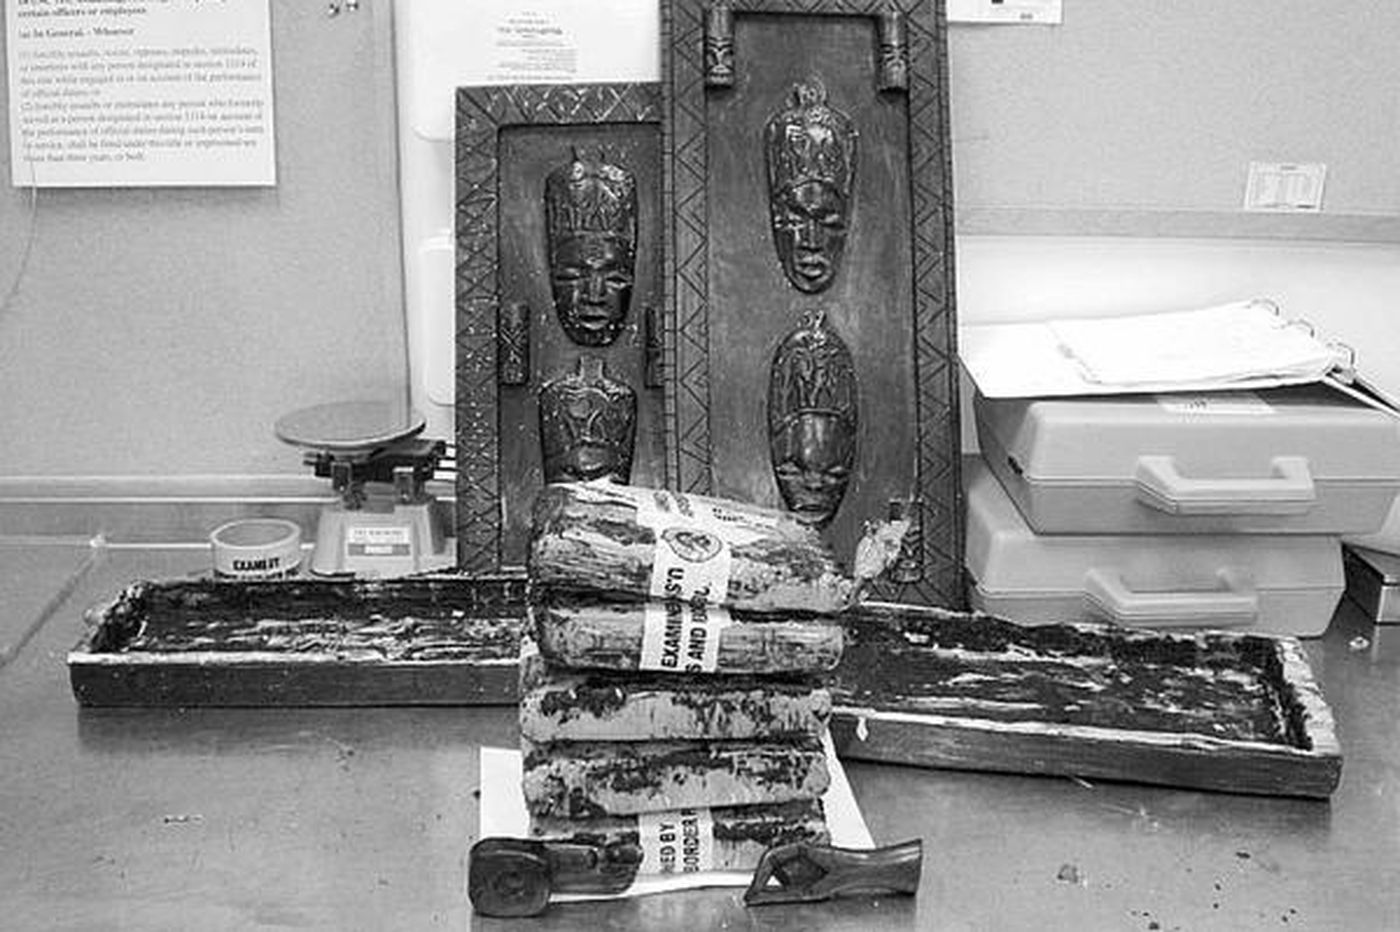 Artsy, crafty smugglers' pot seized